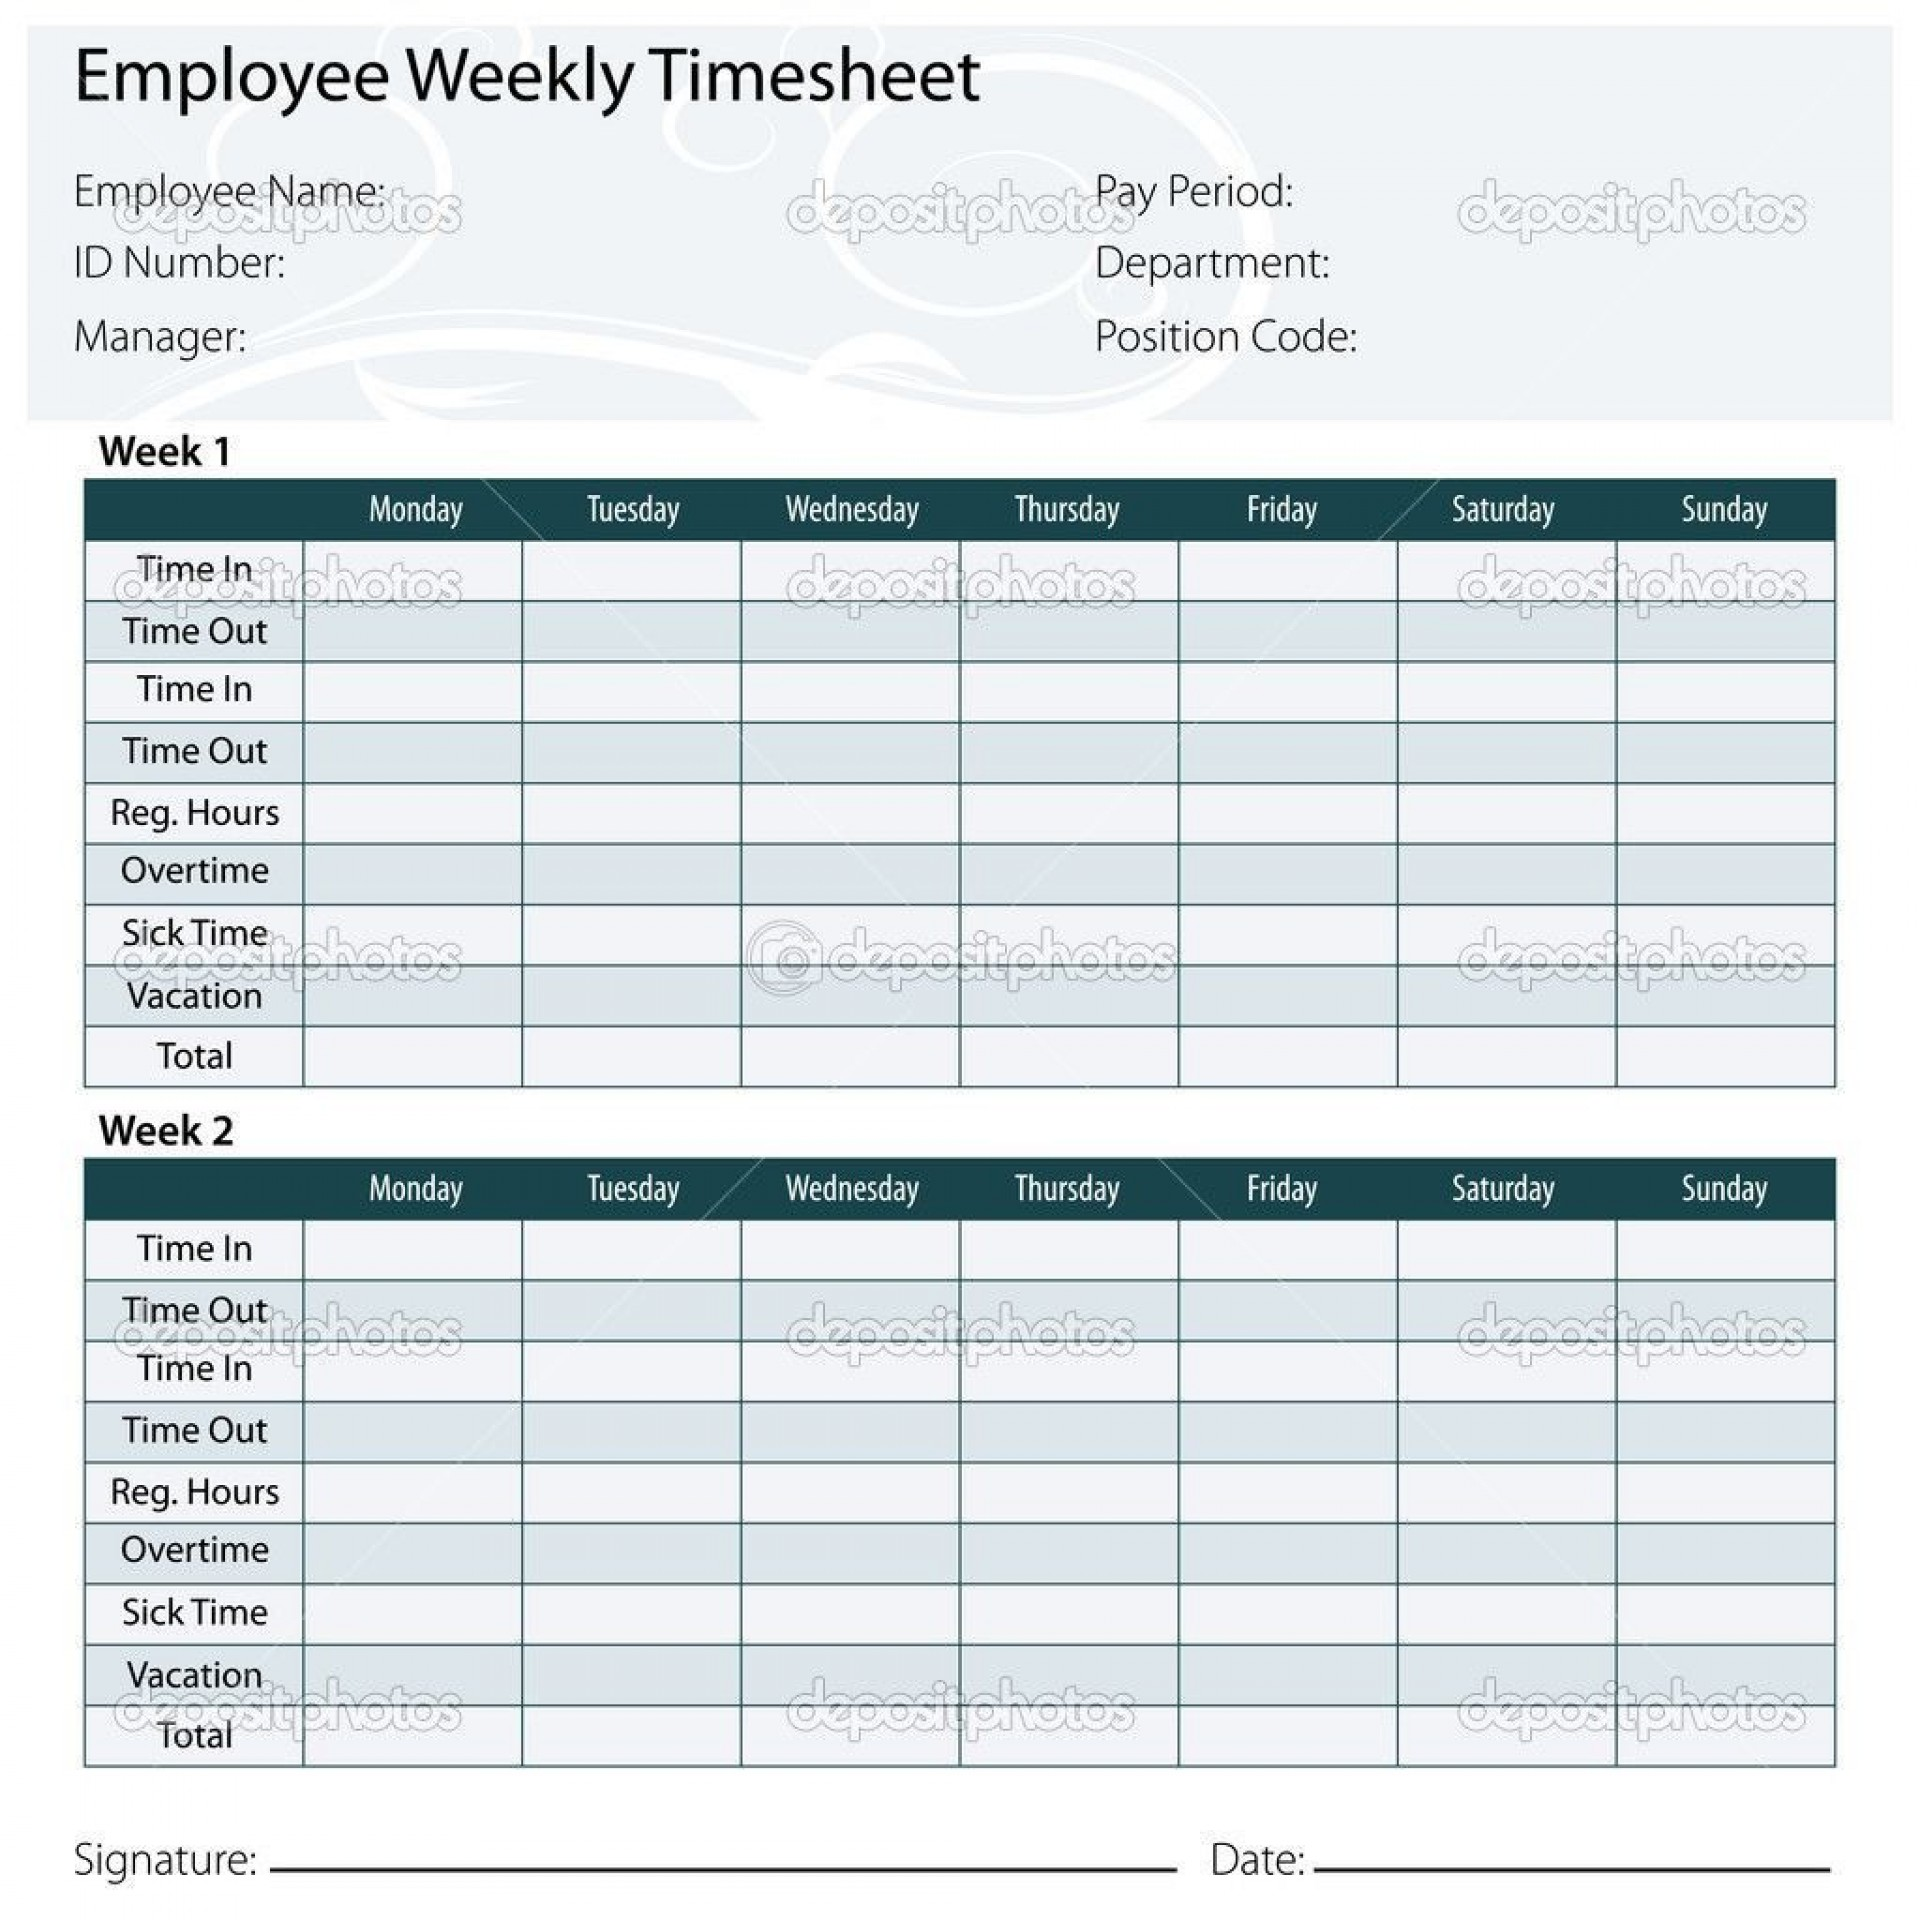 002 Sensational Weekly Timesheet Template Excel Photo  Simple Free1920